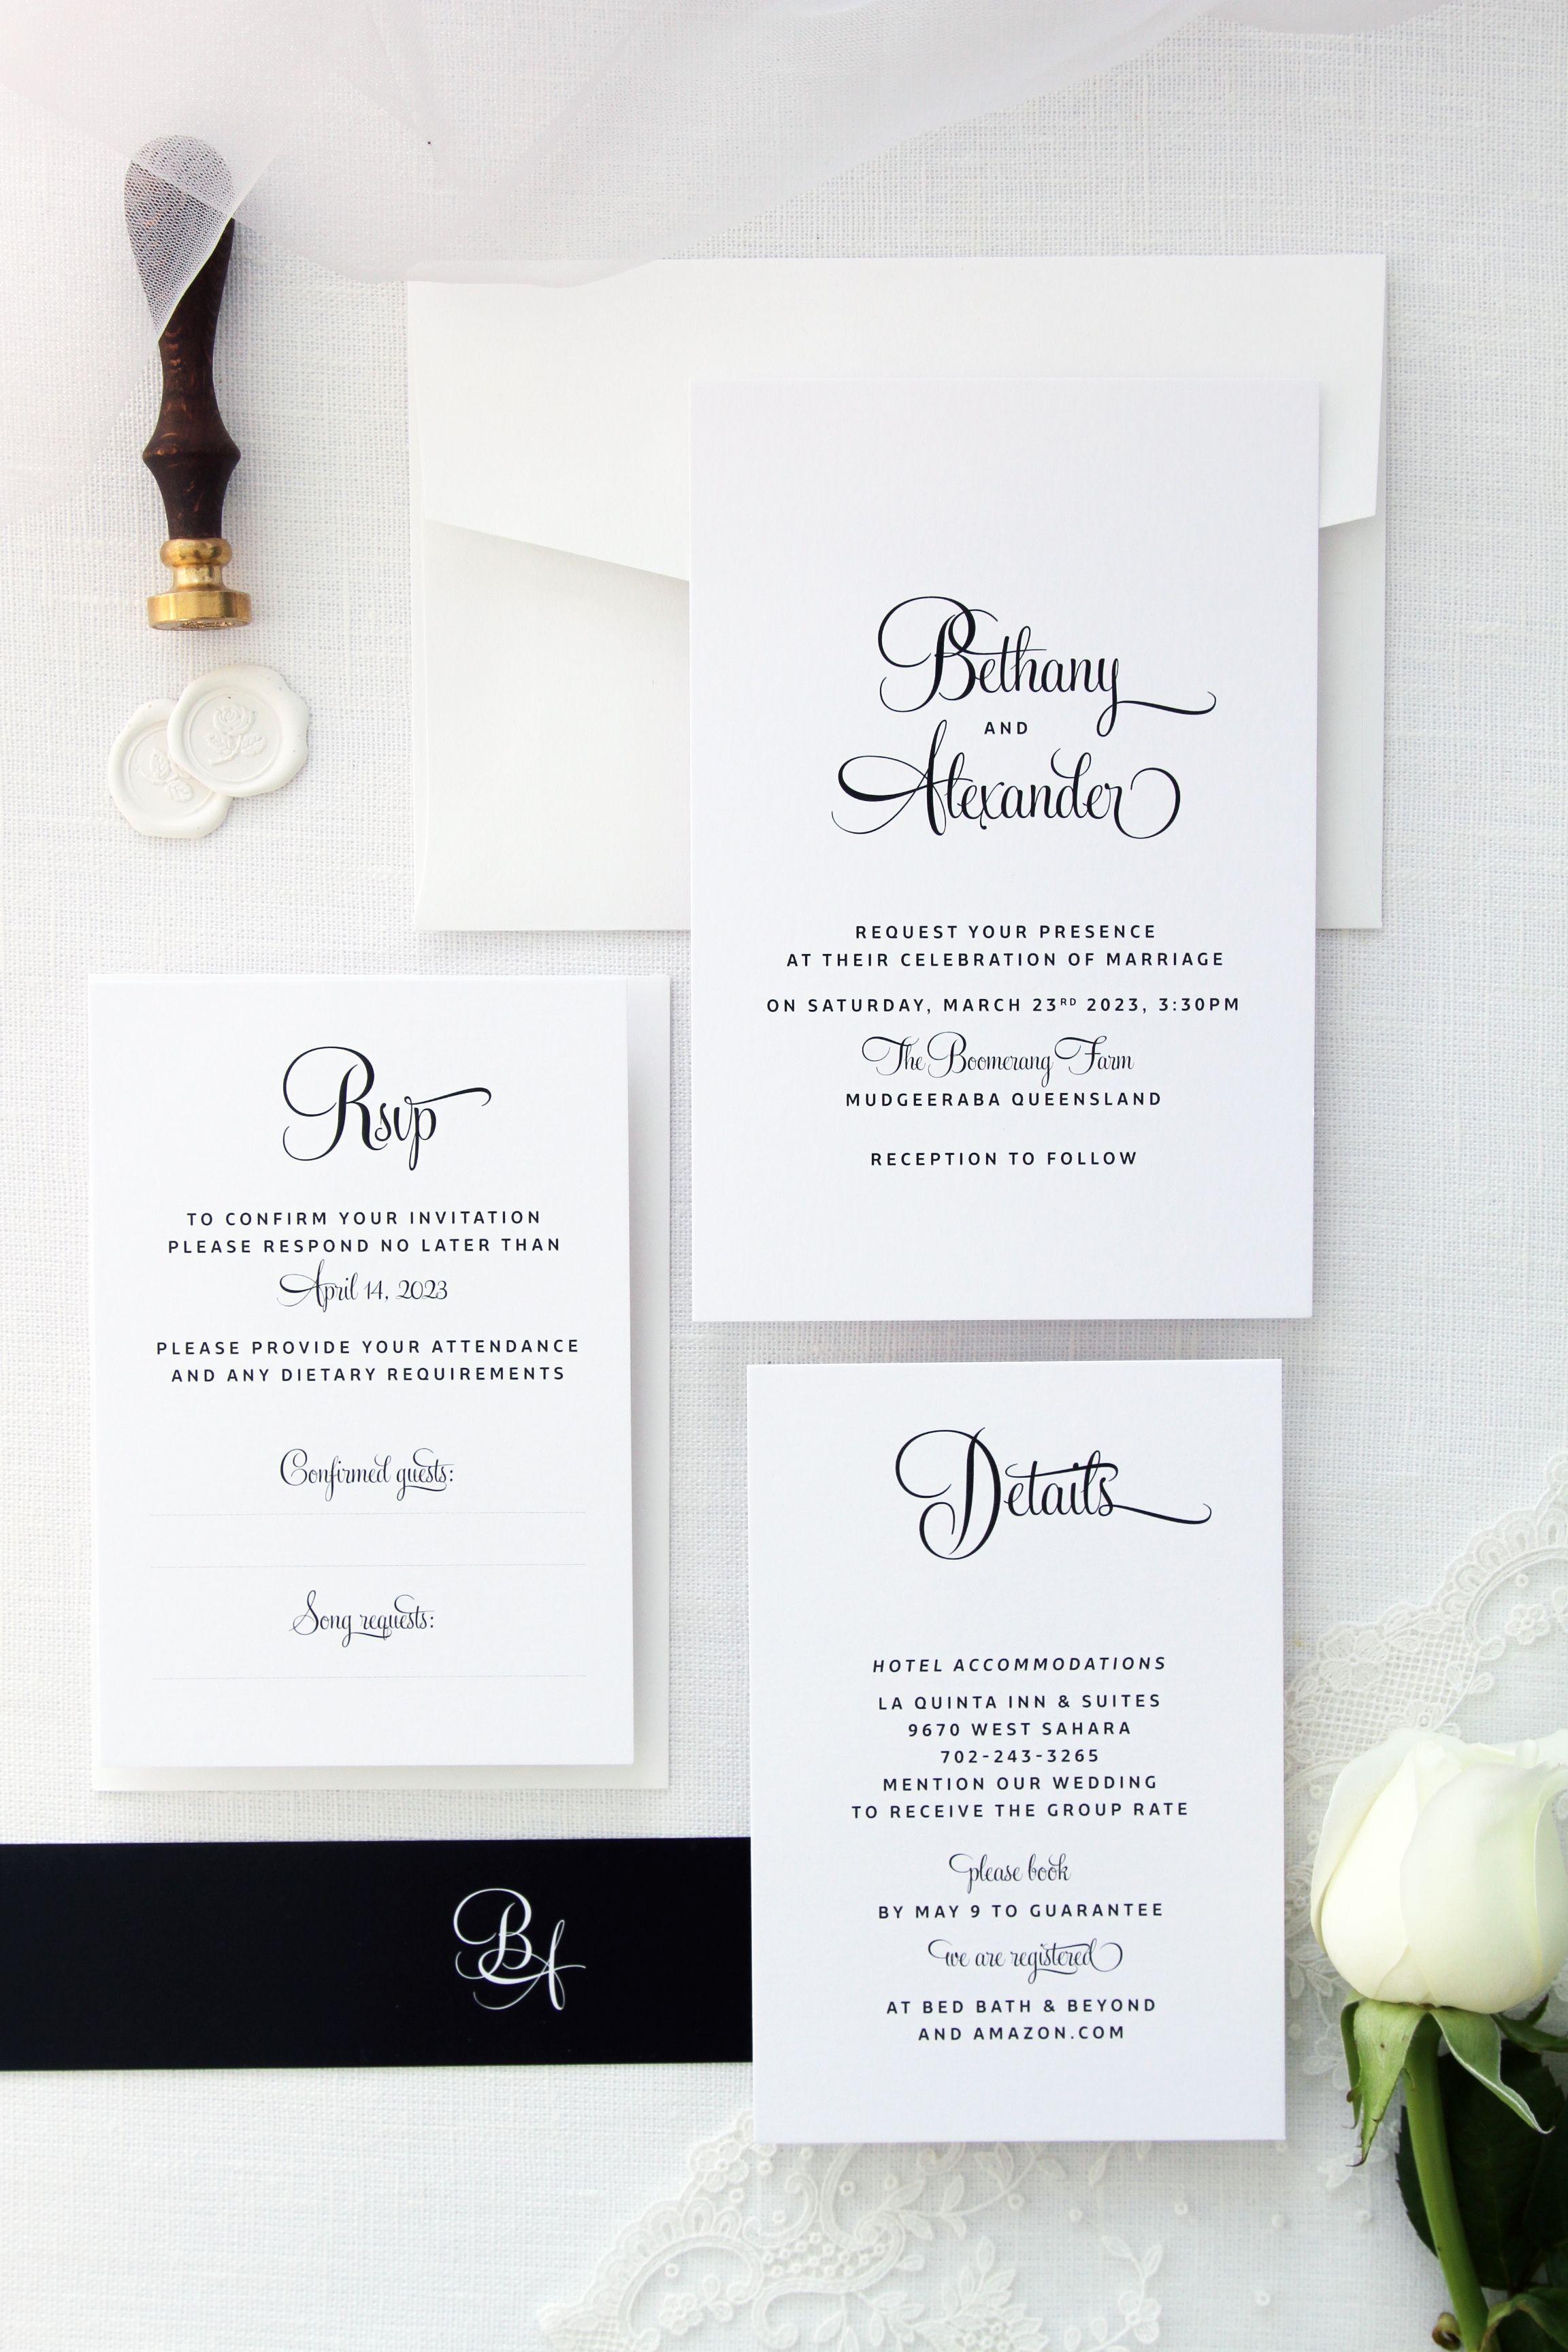 Elegant Wedding Invitation Wedding Invitations Elegant Formal Personalised Wedding Invitations Fun Wedding Invitations